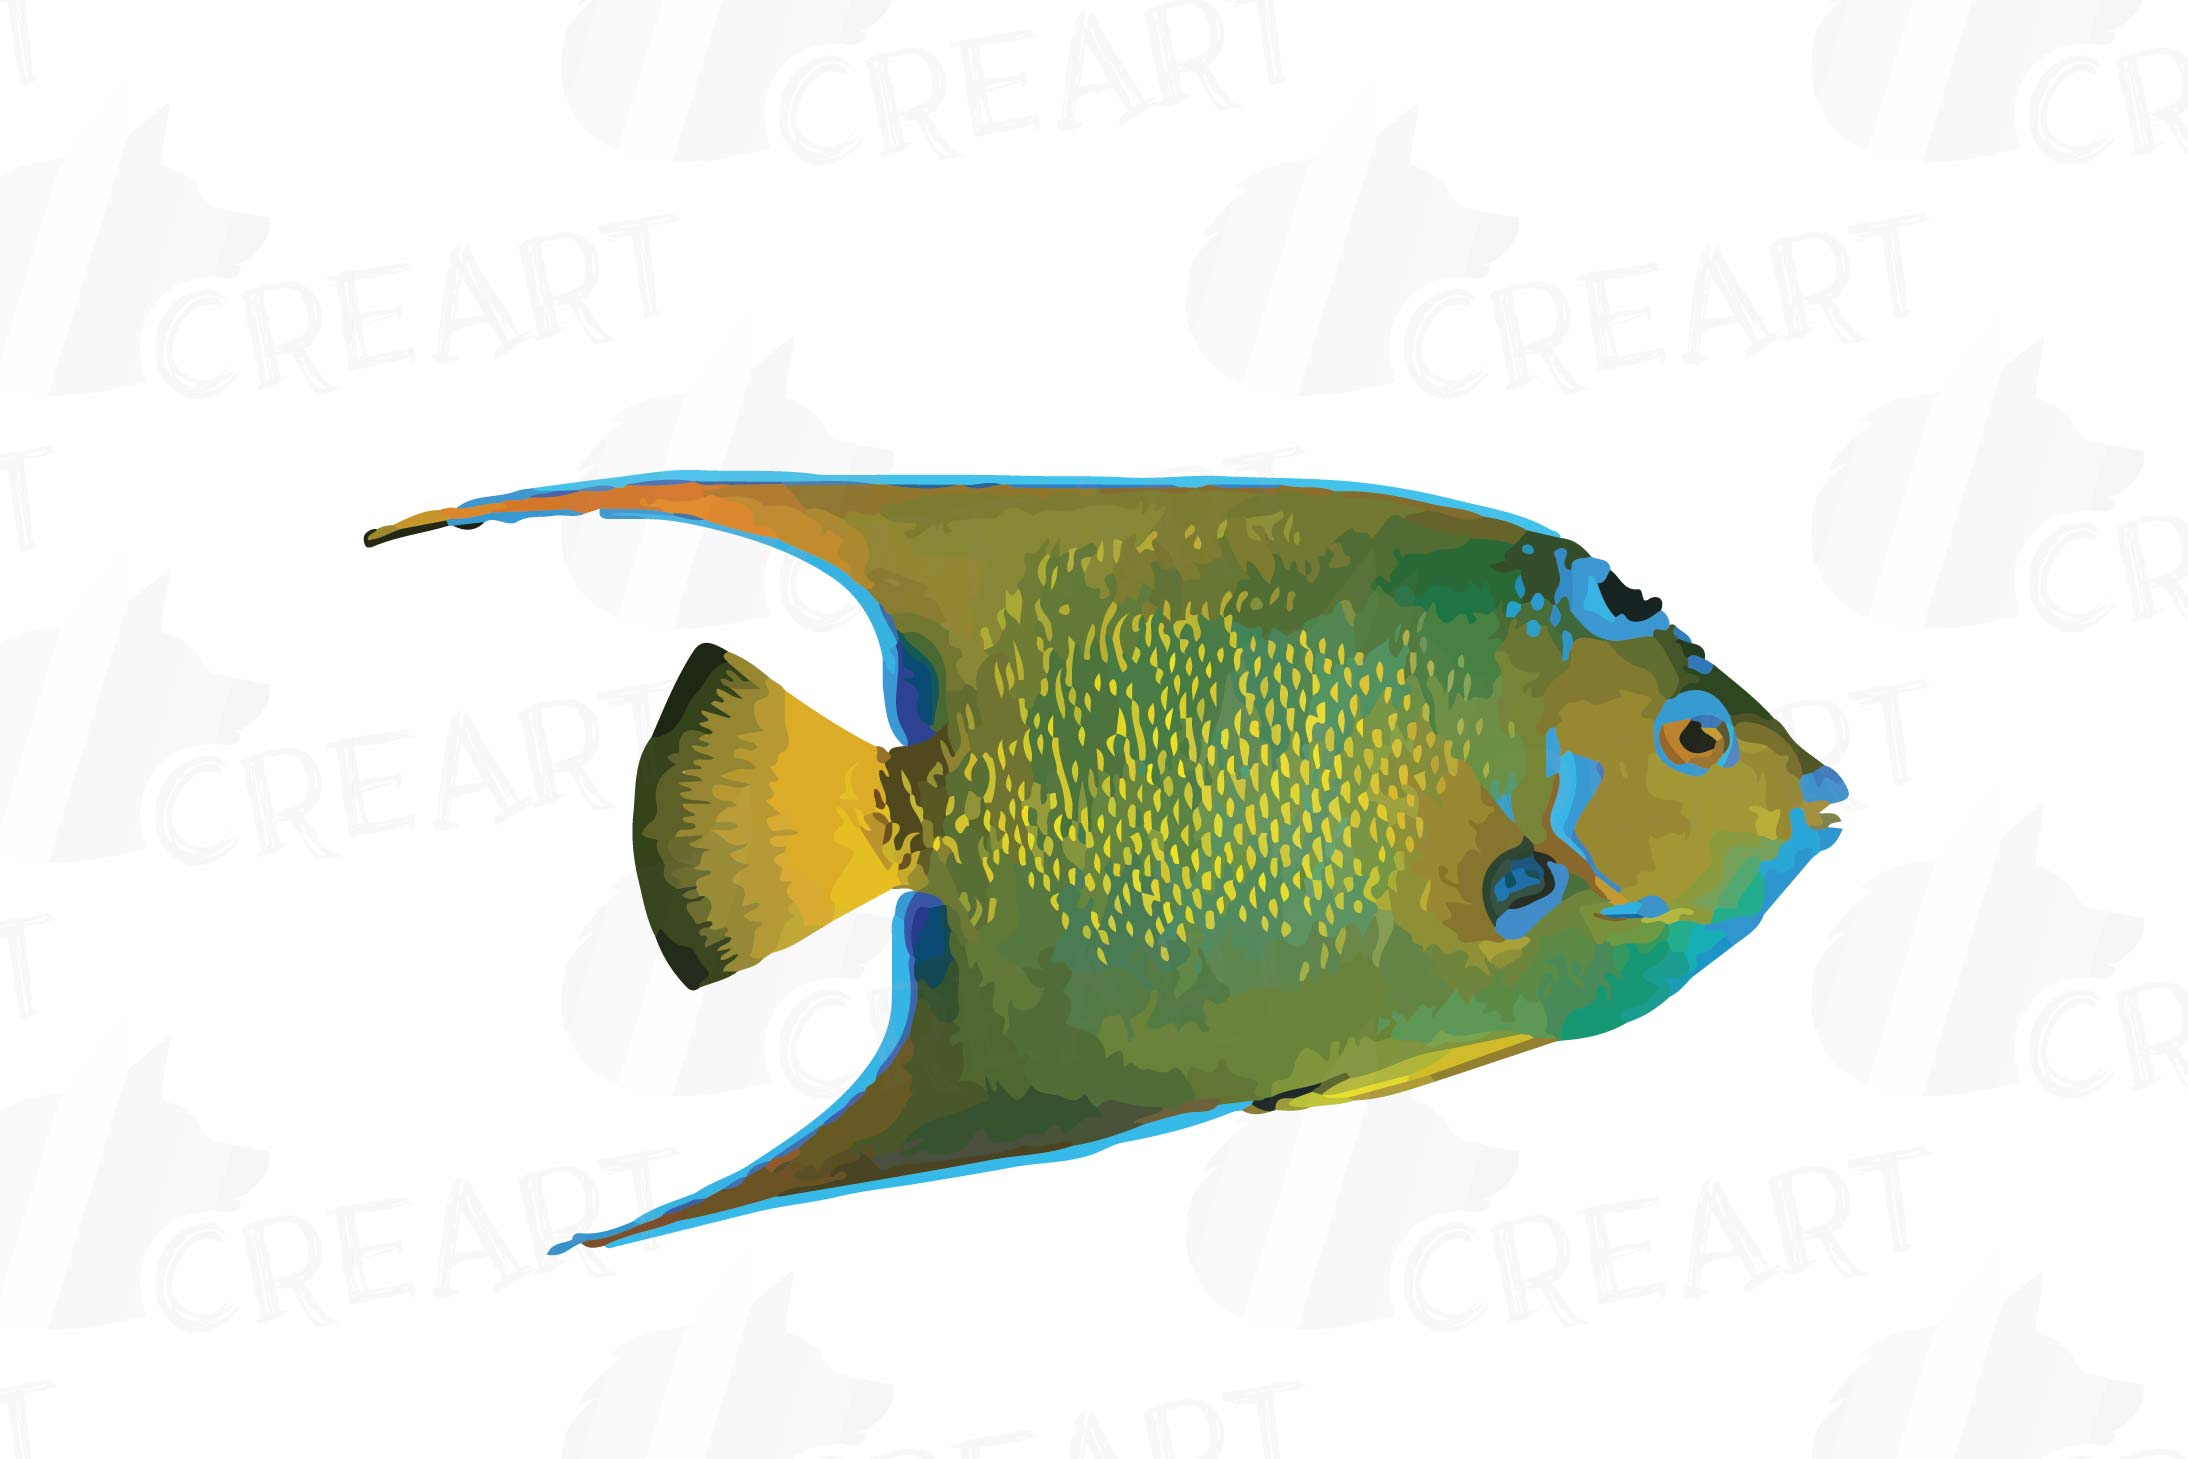 Watecolor Tropical Fish Clip Art 12 Vectors Example Image 6